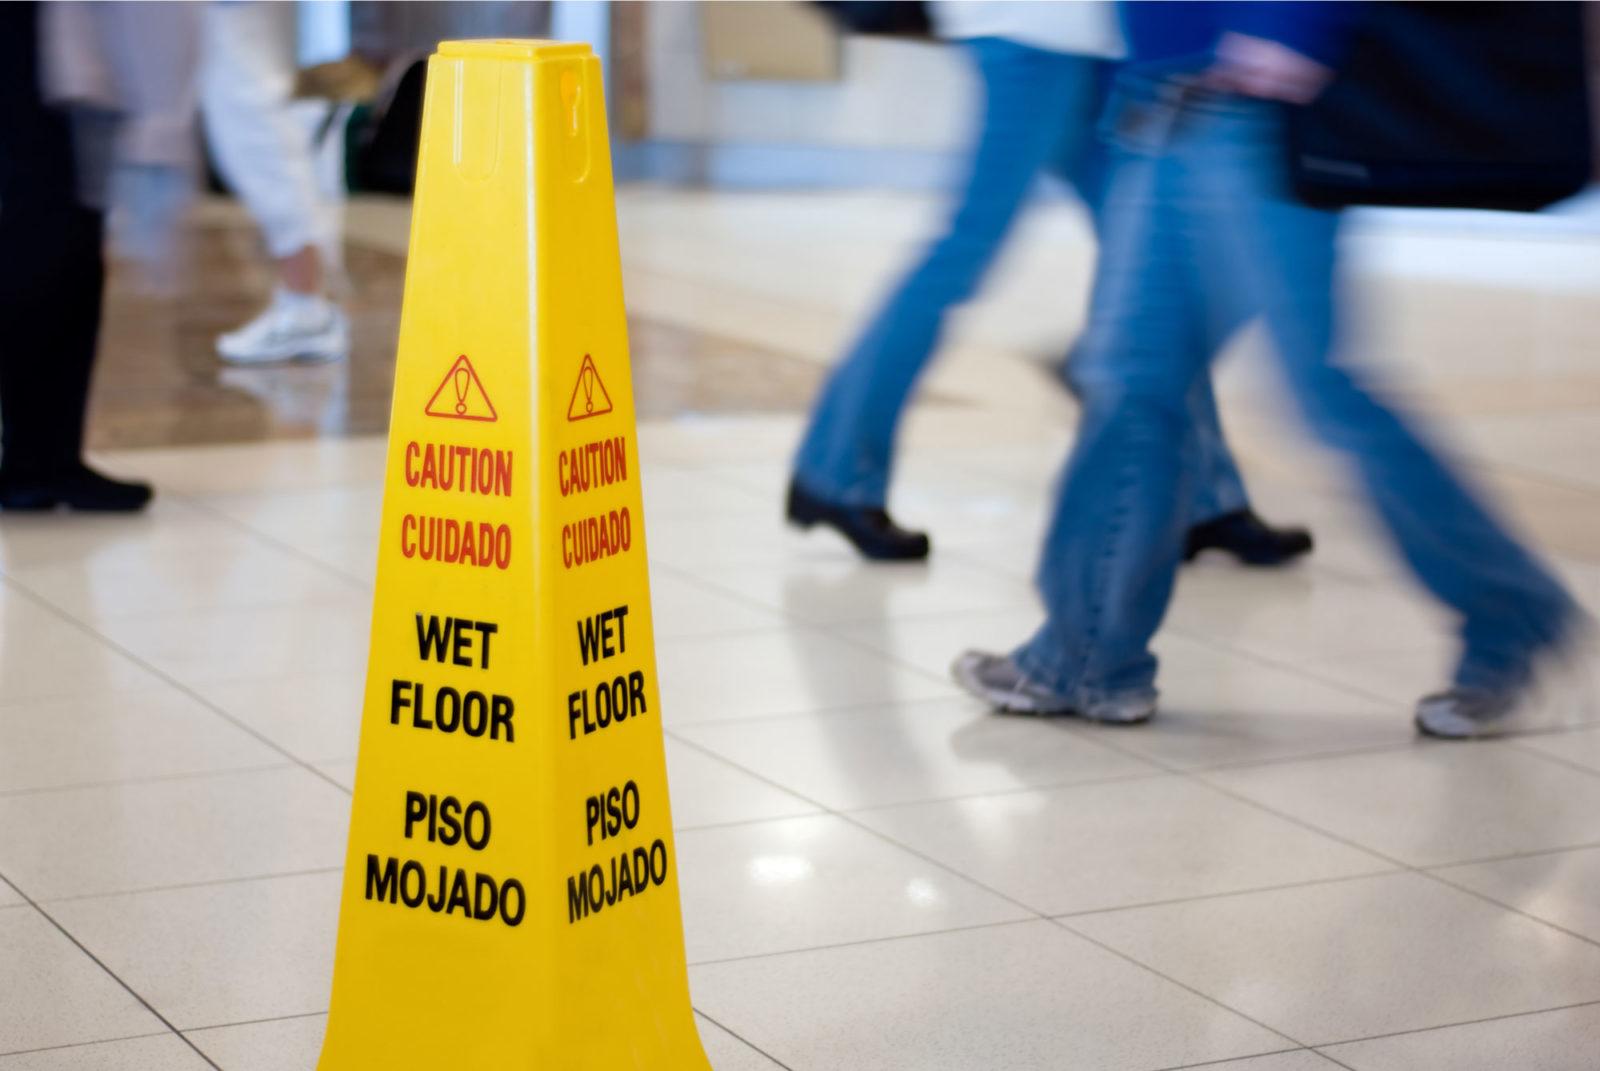 Slip and Fall Personal Injury Law in Marietta - Image of a caution sign / Lesiones Personales incluyen Accidentes por Resbalones y Caídas.